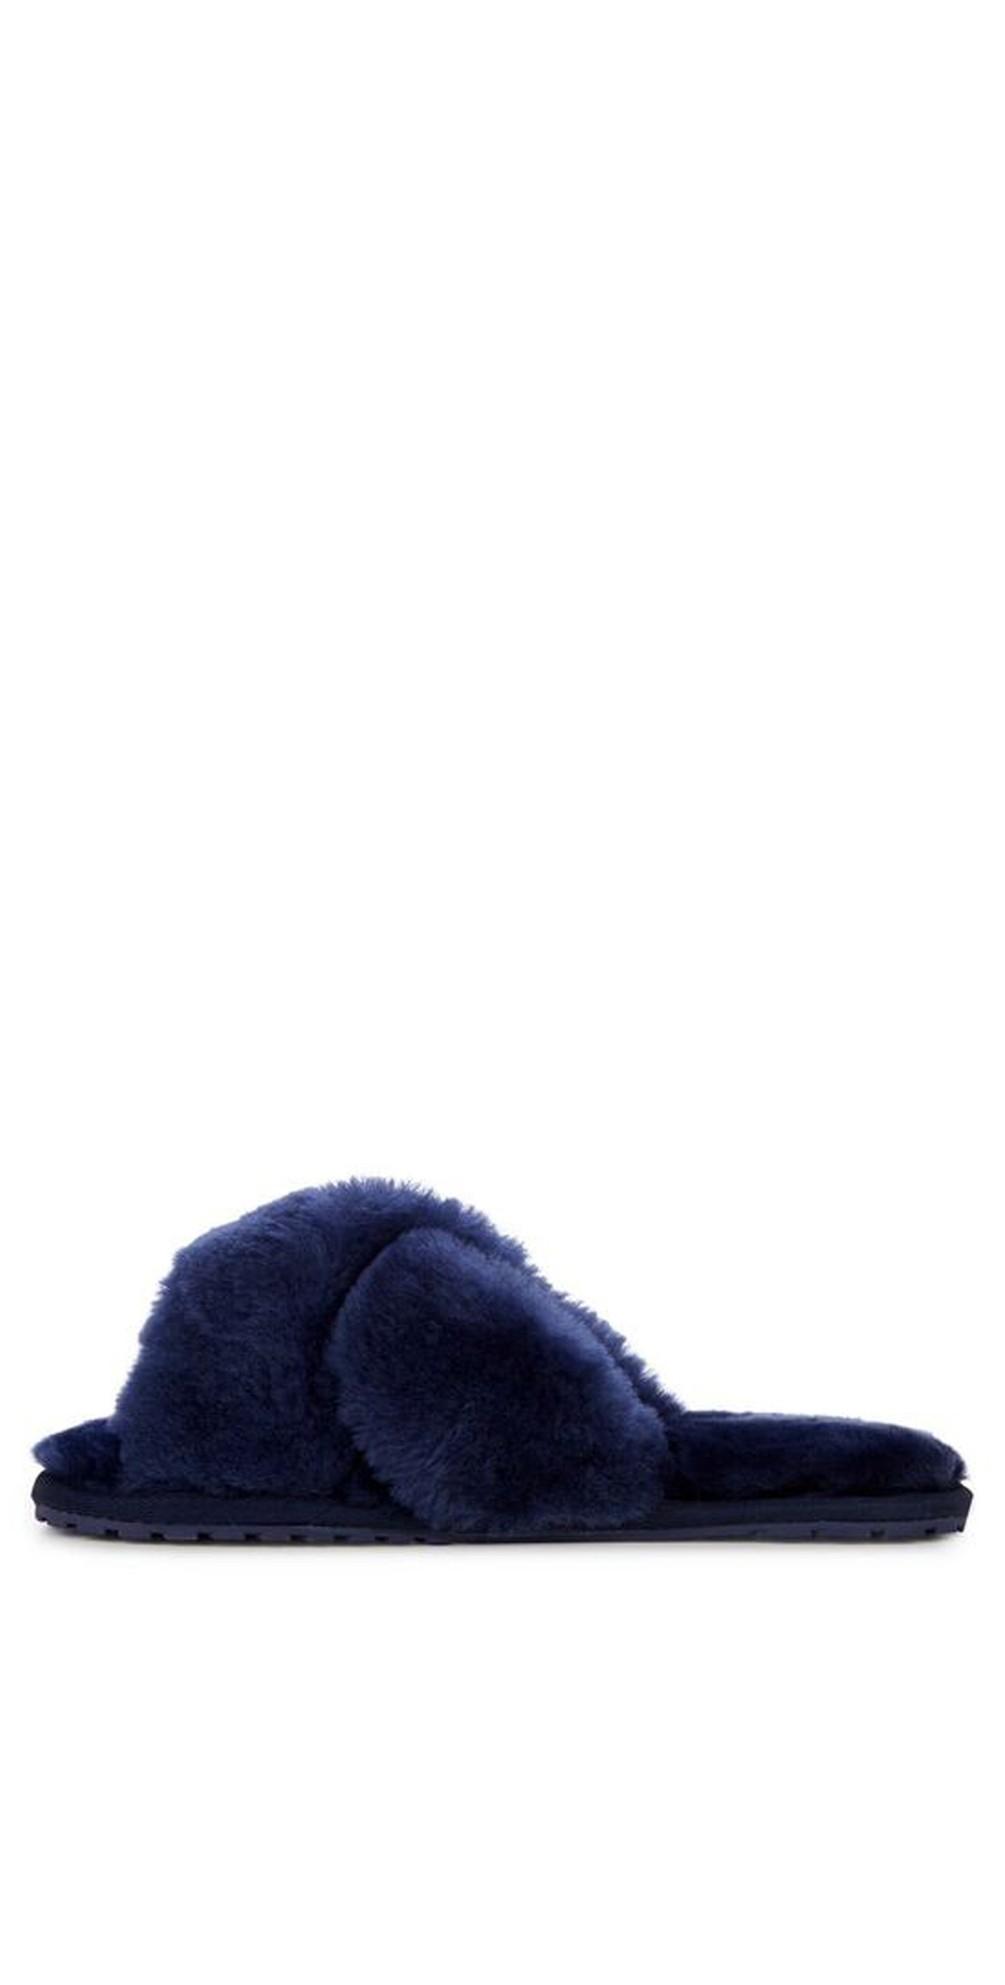 Mayberry Midnight Sheepskin Slider Slipper main image